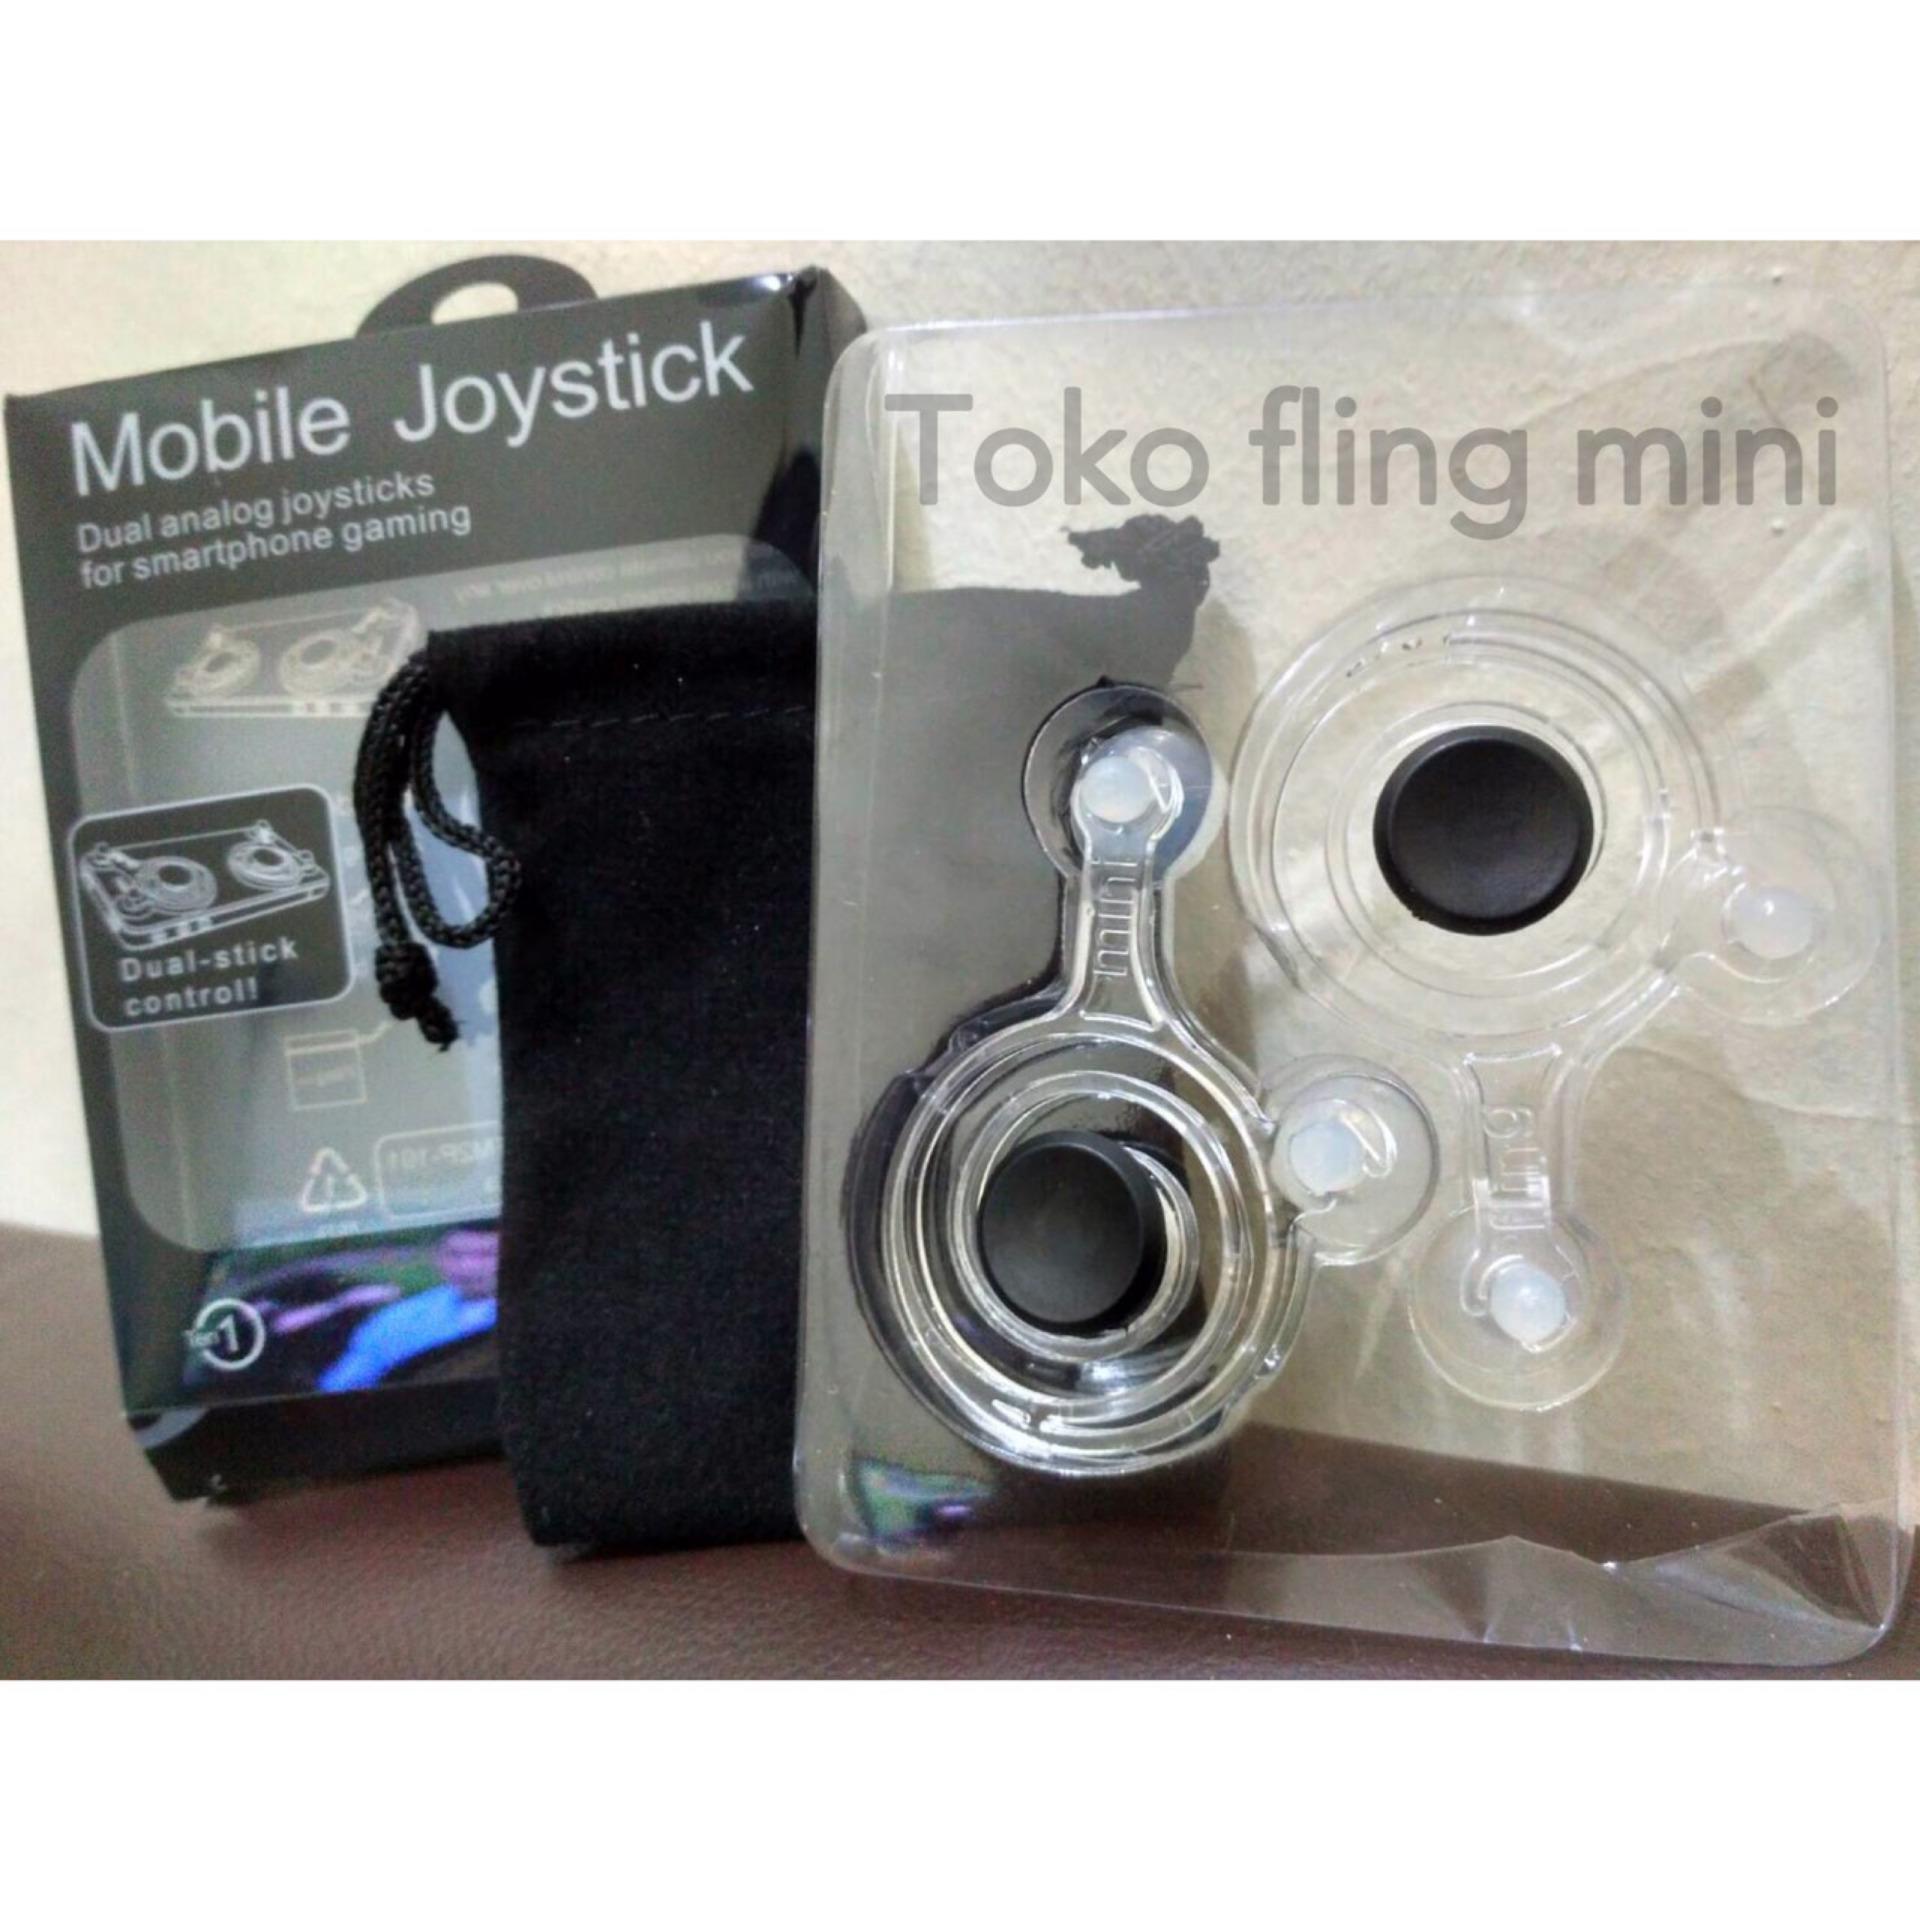 Wanky Fling Mobile Joystick Game Controller Mini For Smartphone Gamepad Hp Android Dan Ios Untuk Iphone Free Pouch